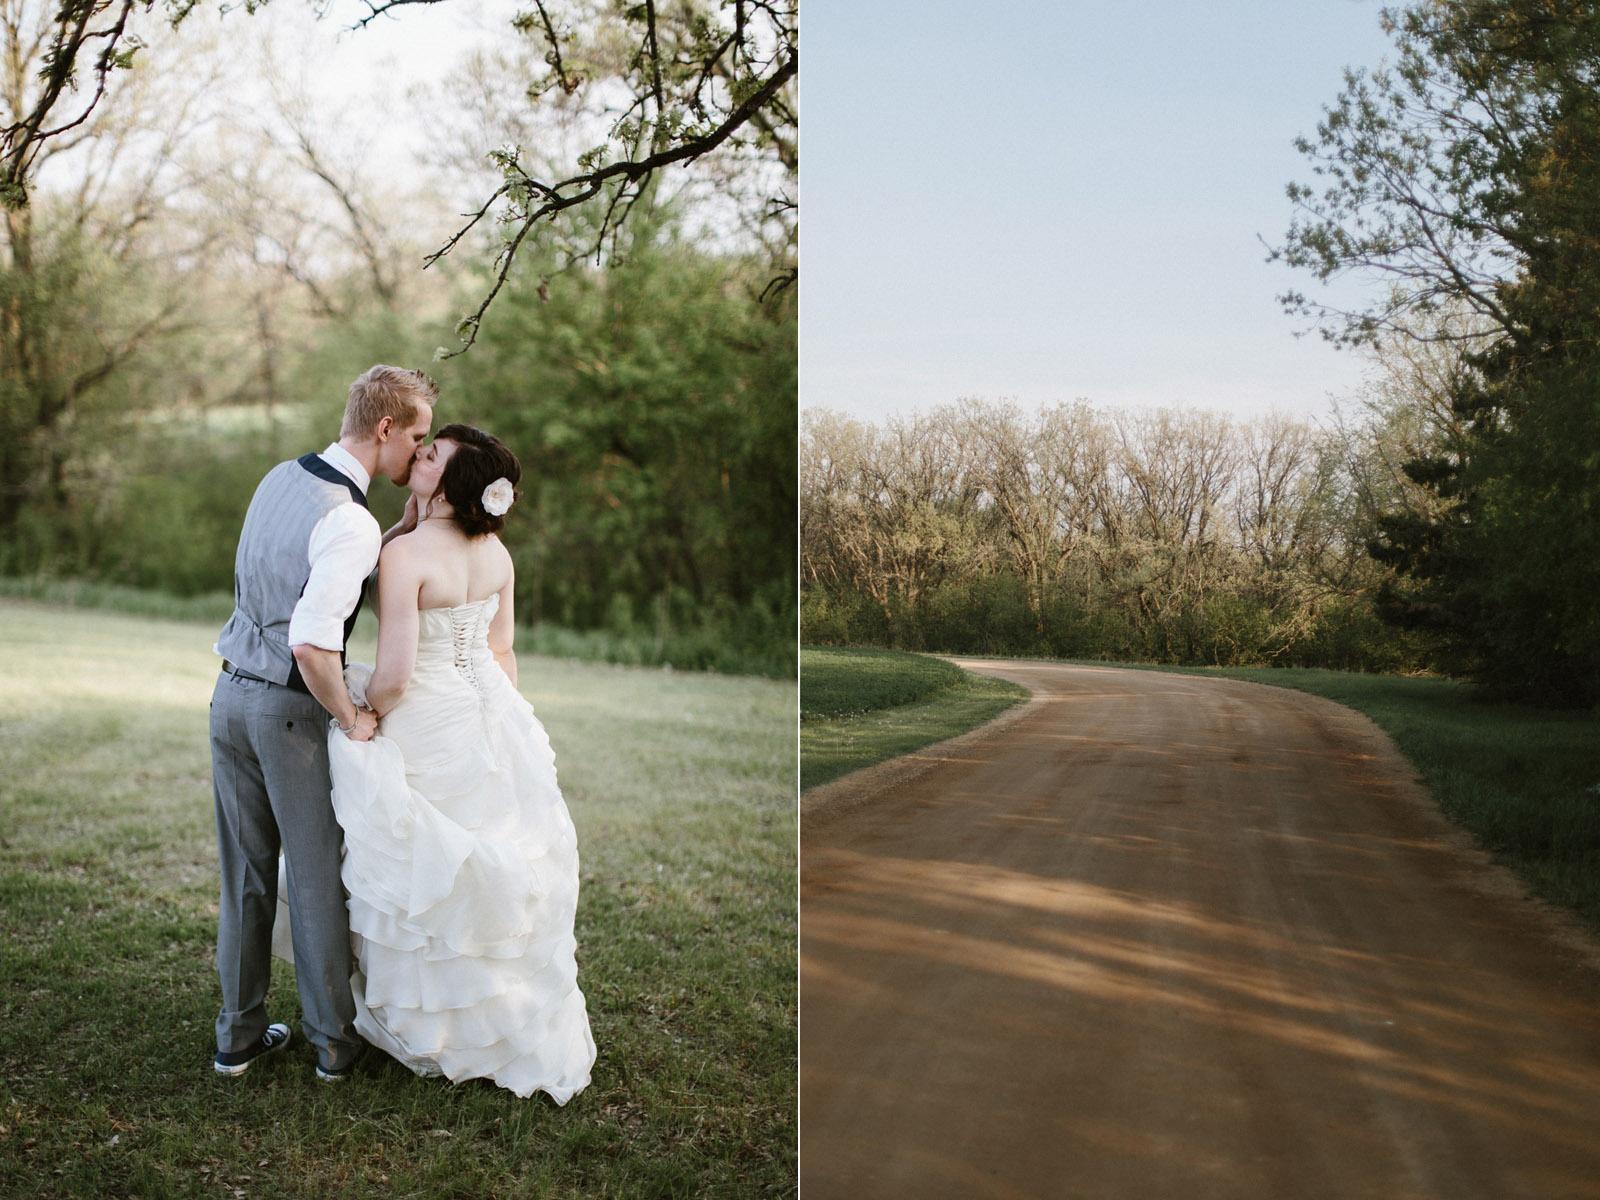 DesMoines_Wedding_Photographer_Spencer&Amanda_098.jpg